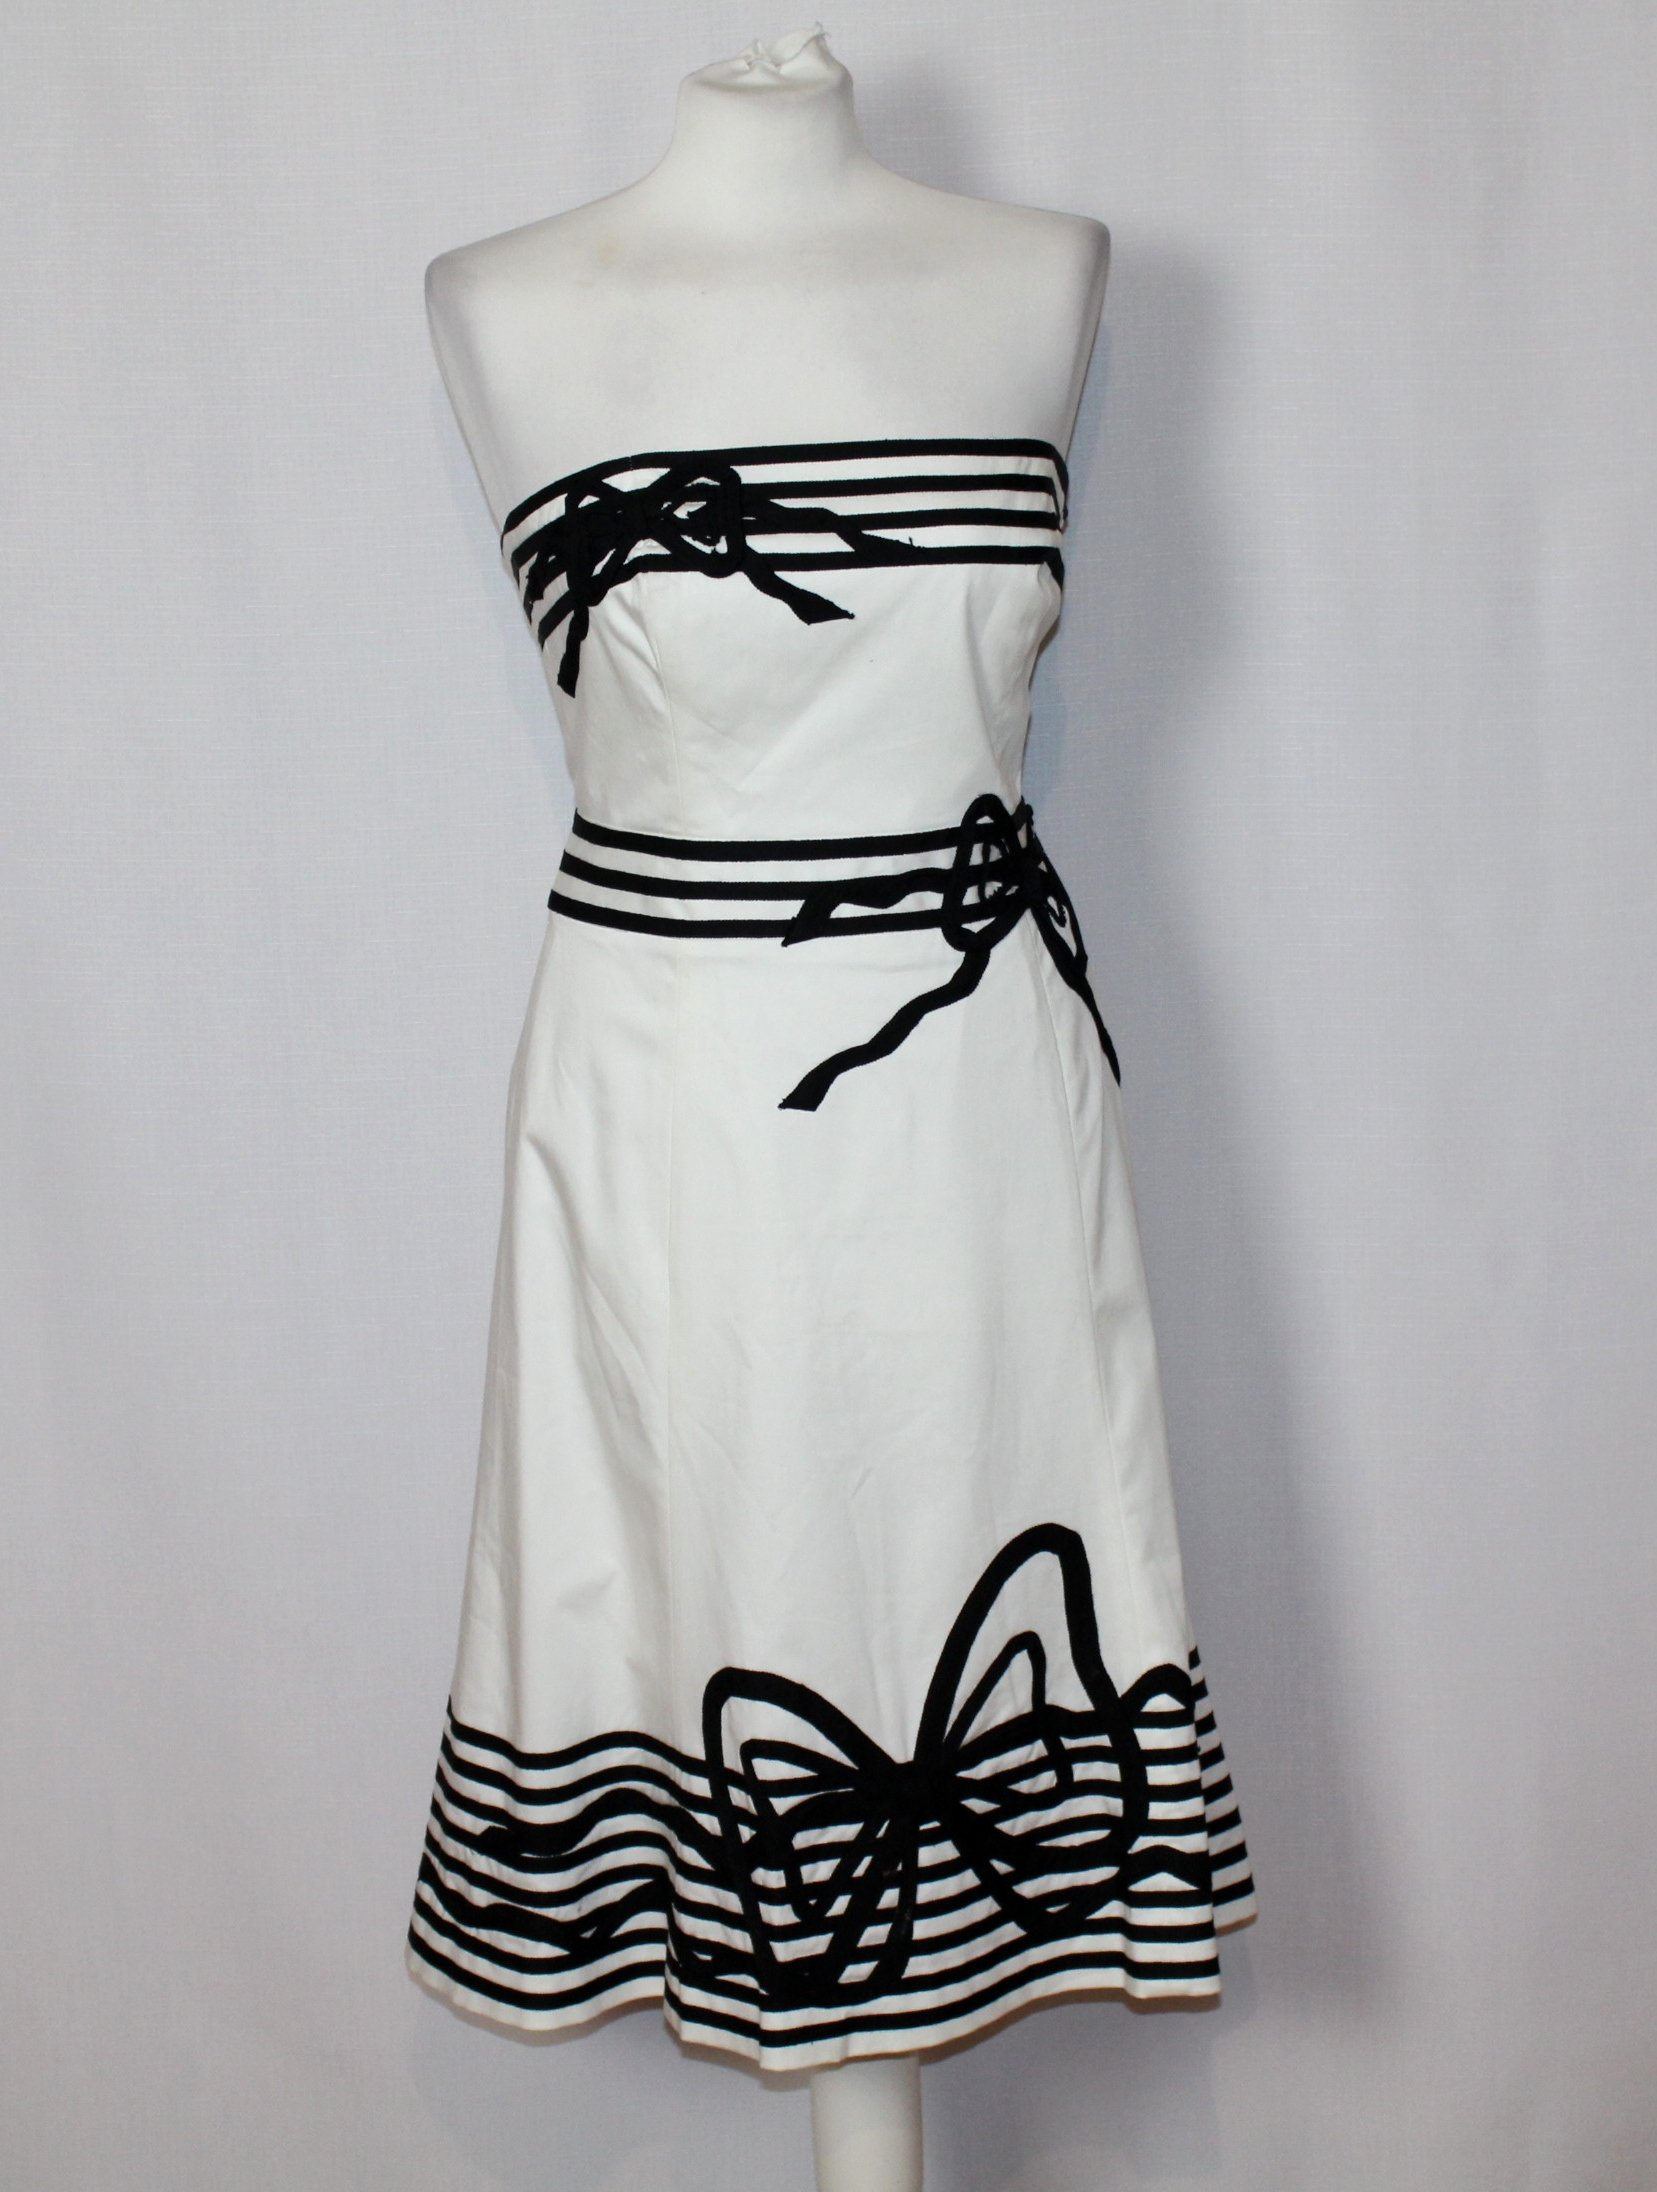 3e129e68fe Biała sukienka bawelniana wzory COAST 38 M 10 - 7216188911 ...